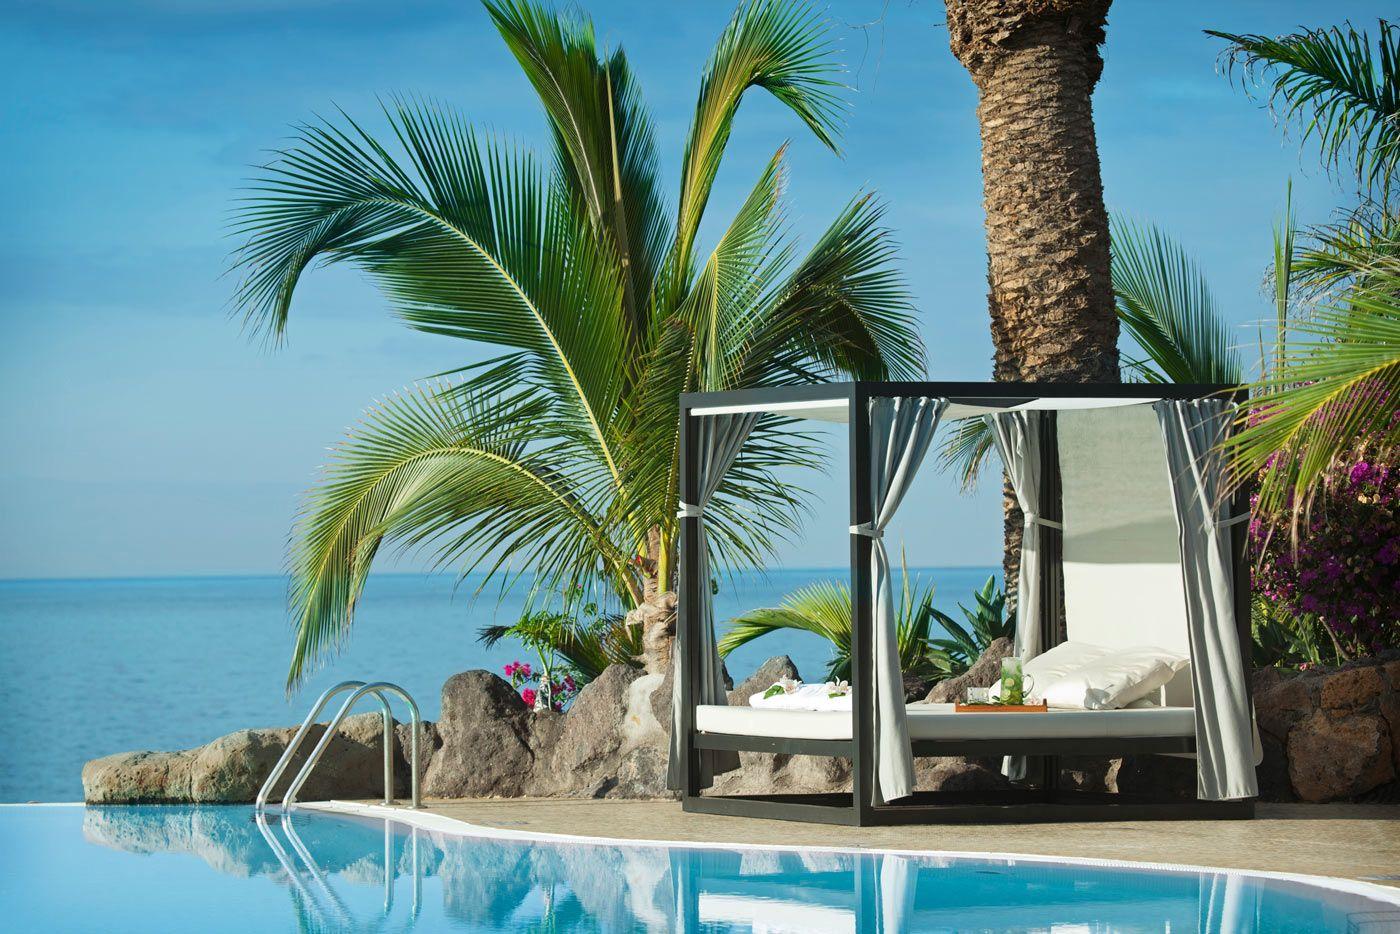 Foto´s en video´s | Hotel Roca Nivaria | Playa Paraíso | Adeje | Tenerife | Officiële website